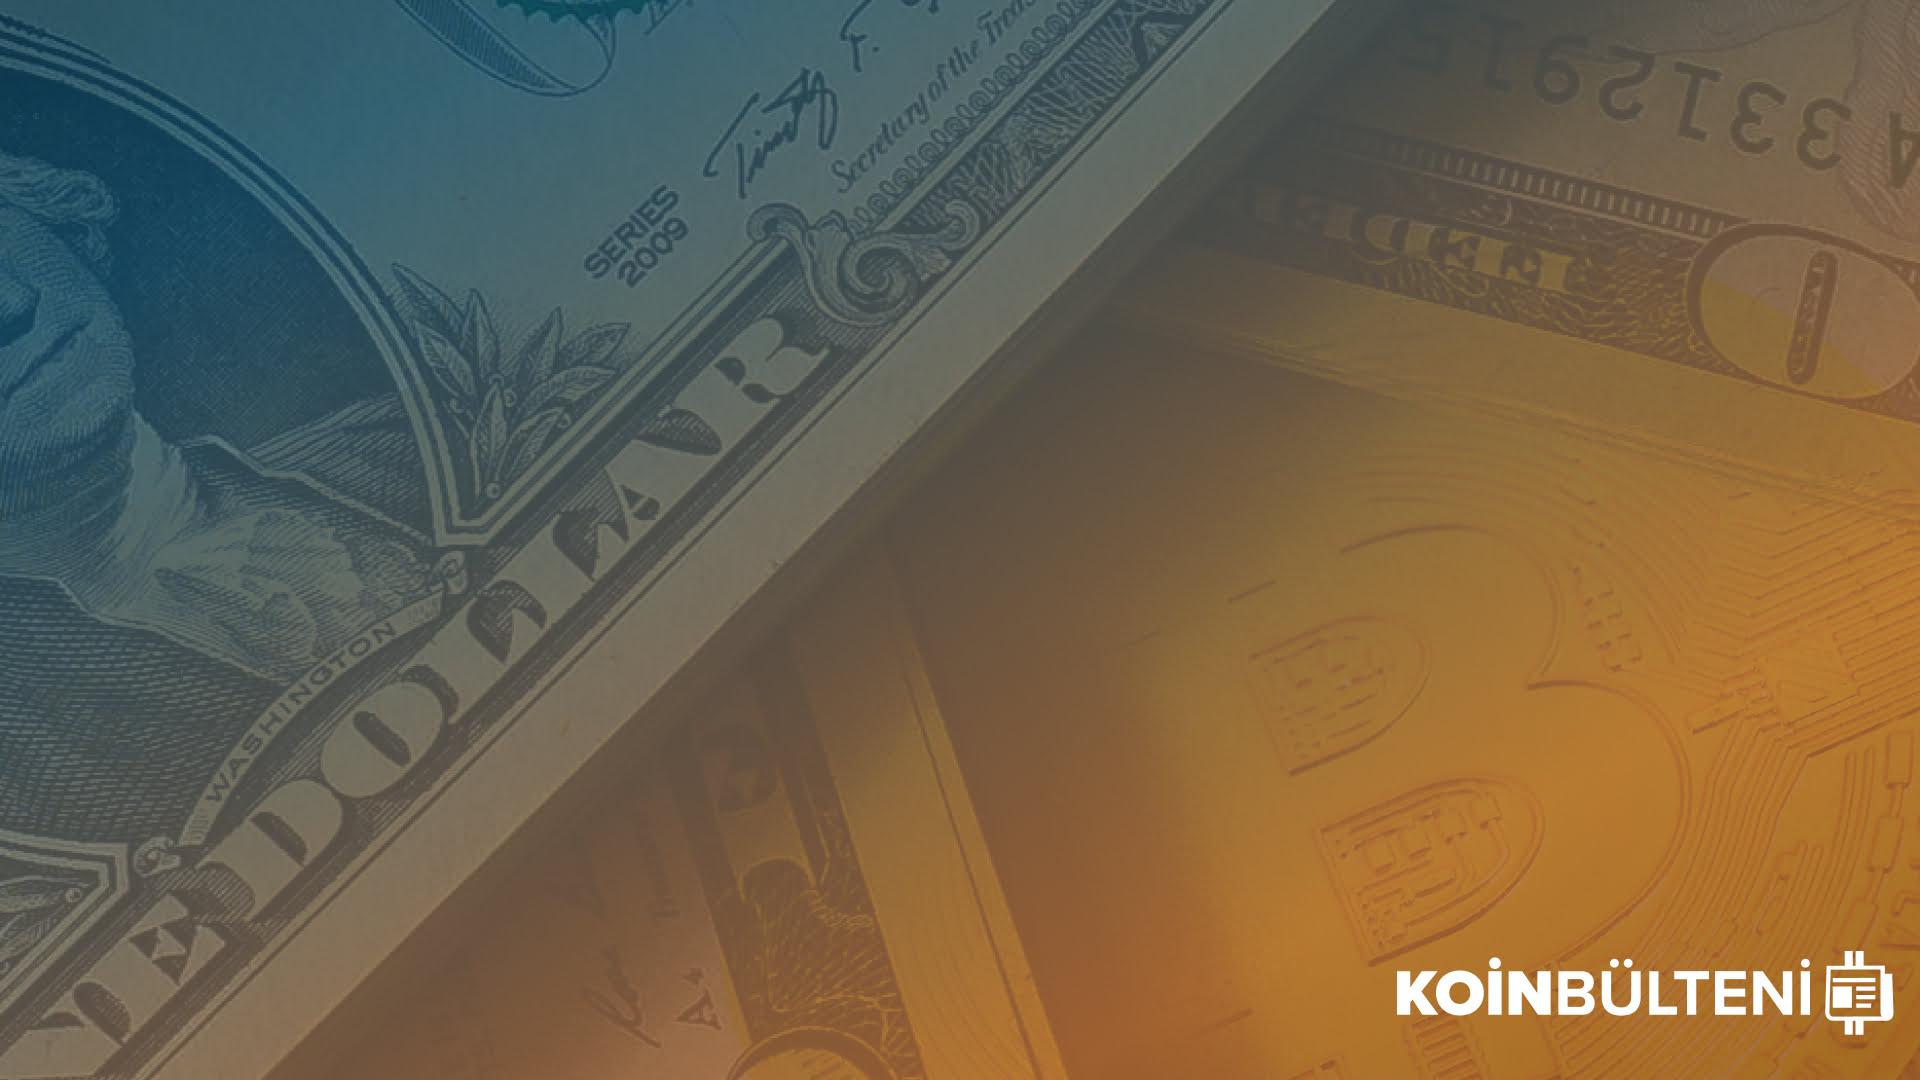 bitcoin-btc-usd-dolar-fiyat-rekor-grafik-turk-lira-yatirim